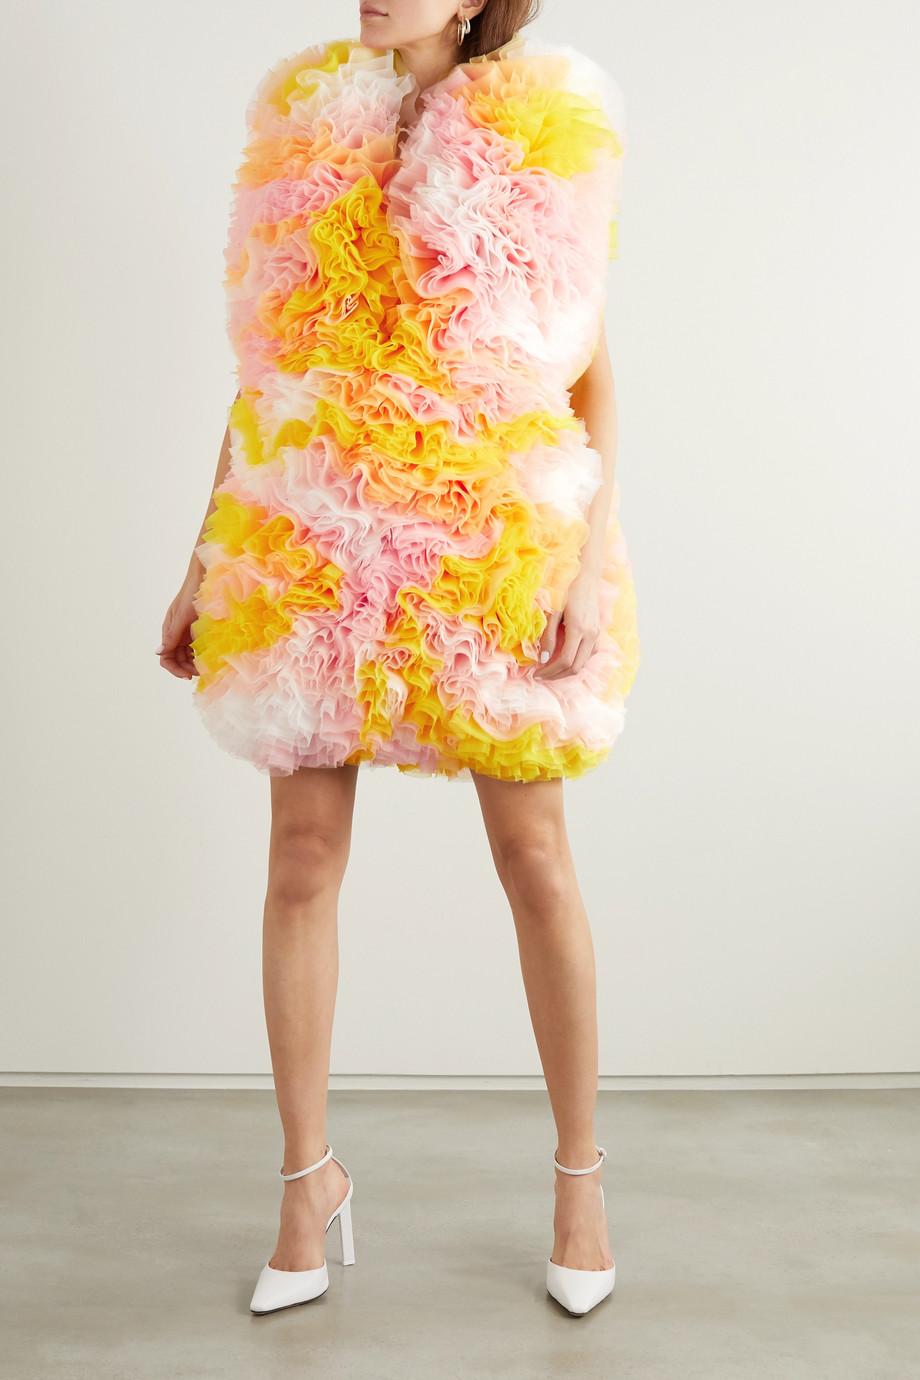 Tomo Koizumi X Emilio Pucci Ruffled tulle mini dress